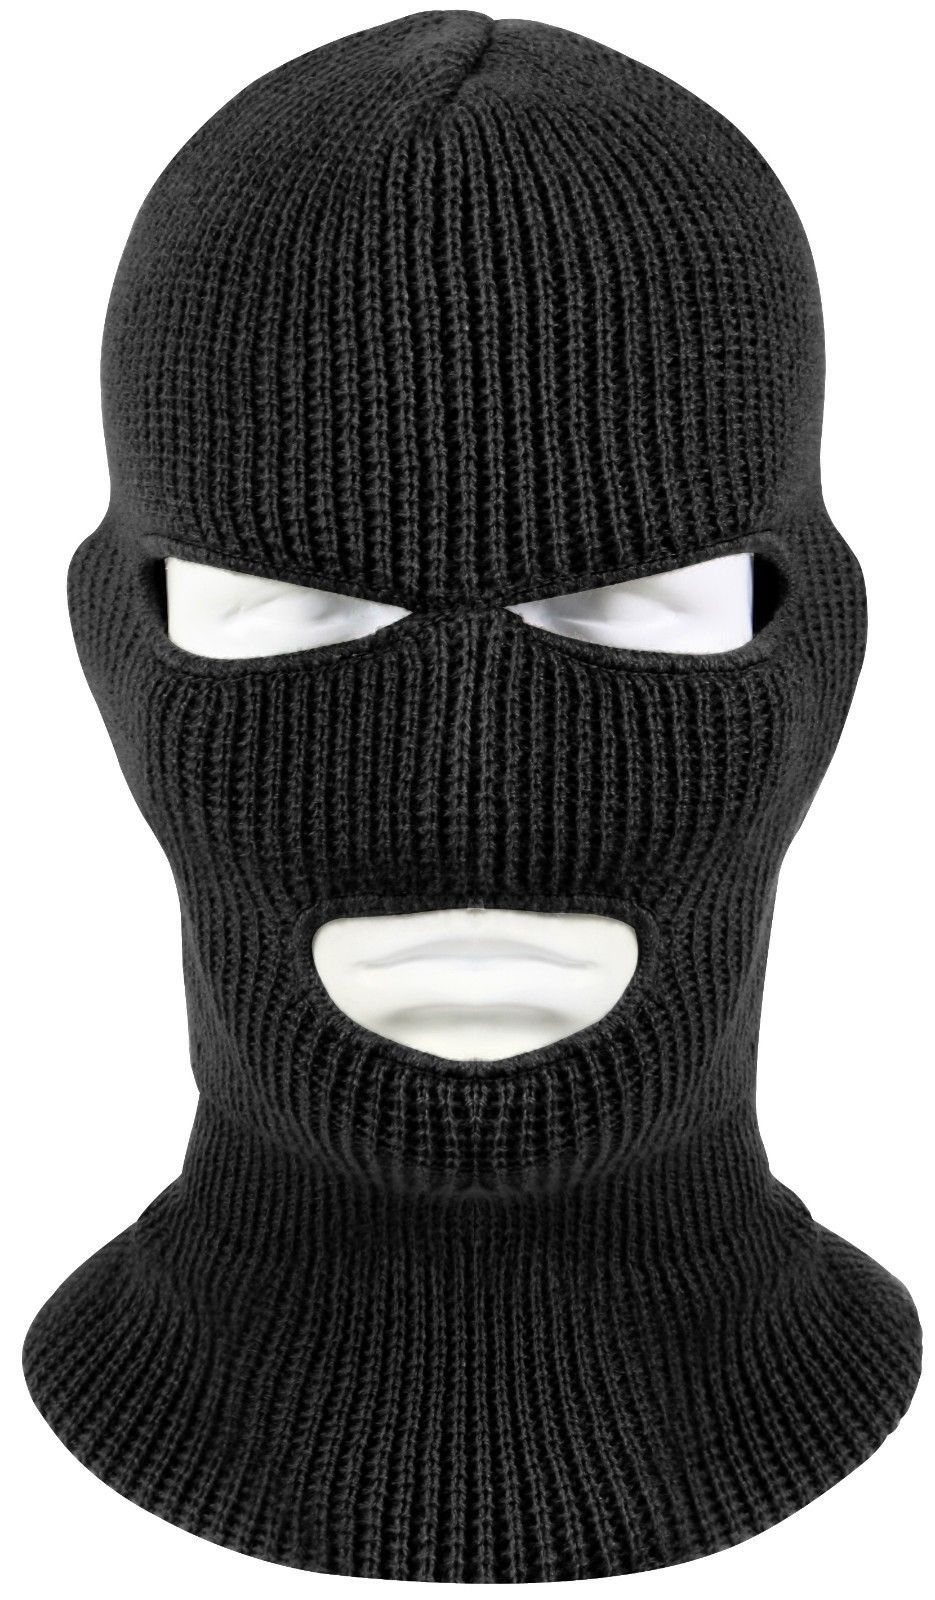 c2c4755da87 3 Hole Black Face Mask Ski Mask Winter Cap Balaclava Hood Army Tactical Mask